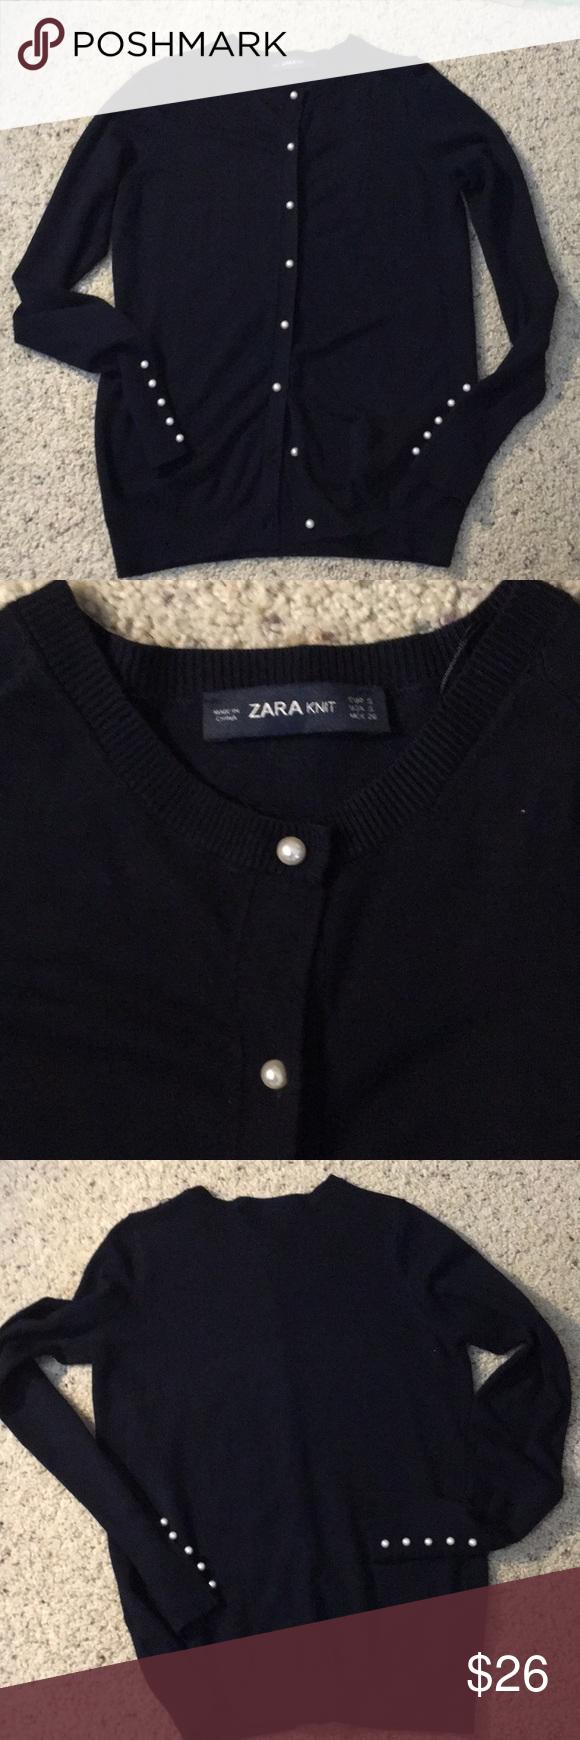 Zara Nwt Navy Blue Cardigan With Faux Pearl Button Navy Blue Cardigan Cardigan Zara